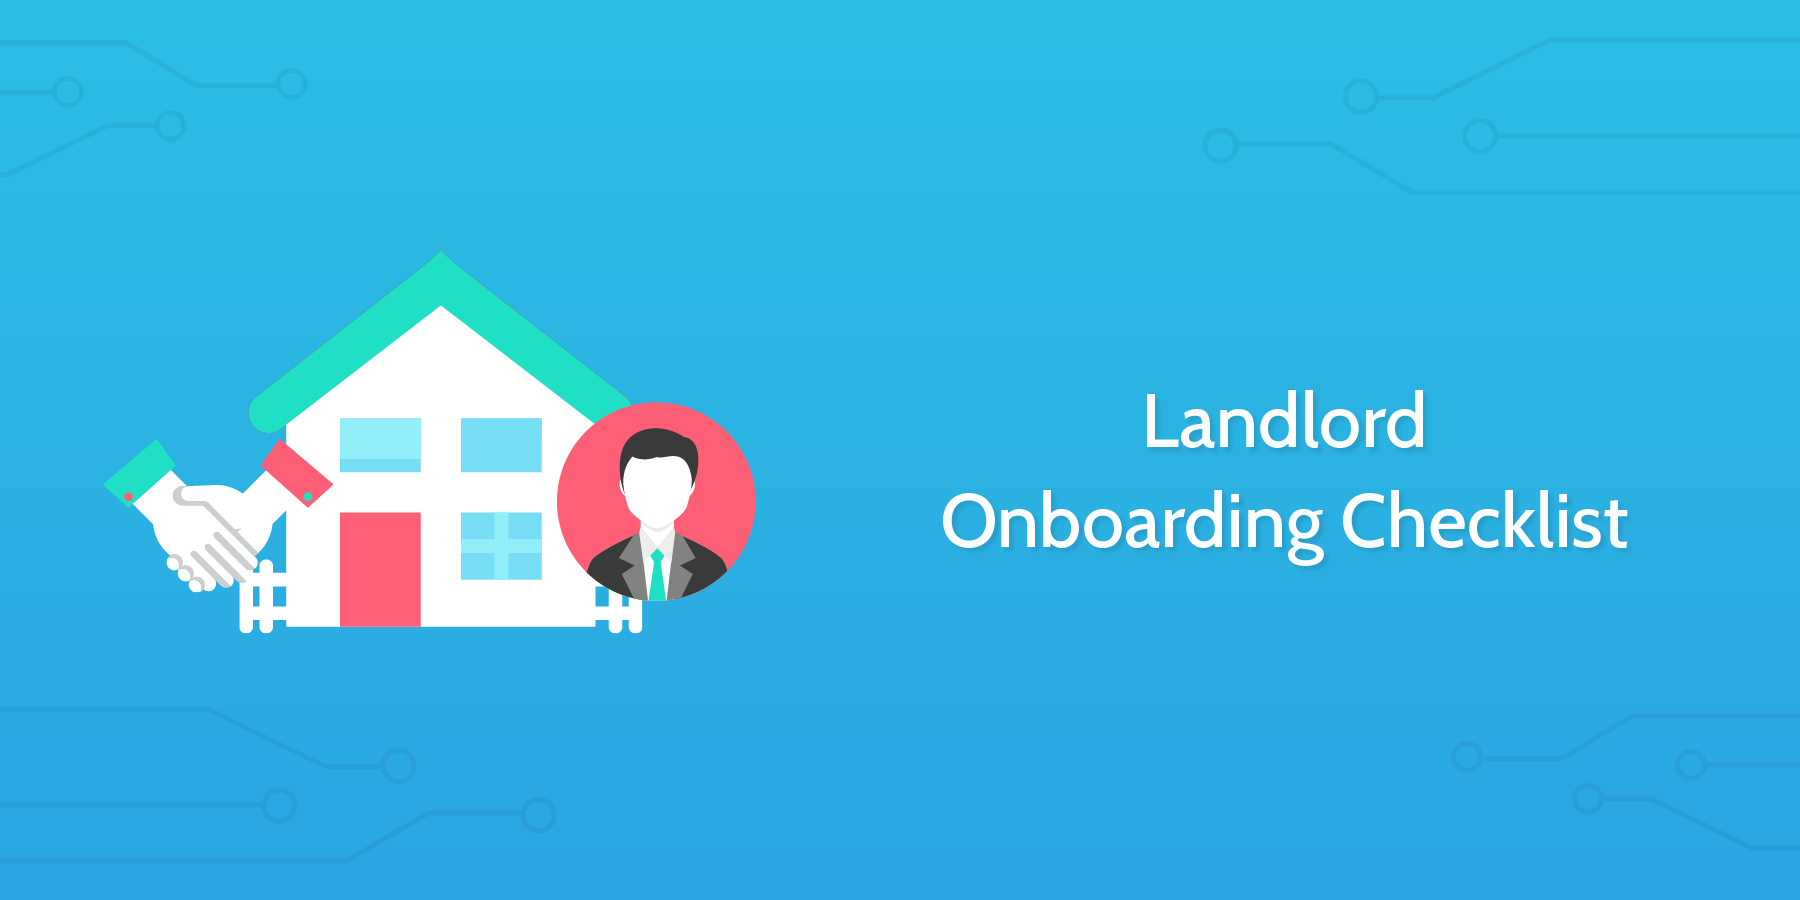 landlord onboarding checklist